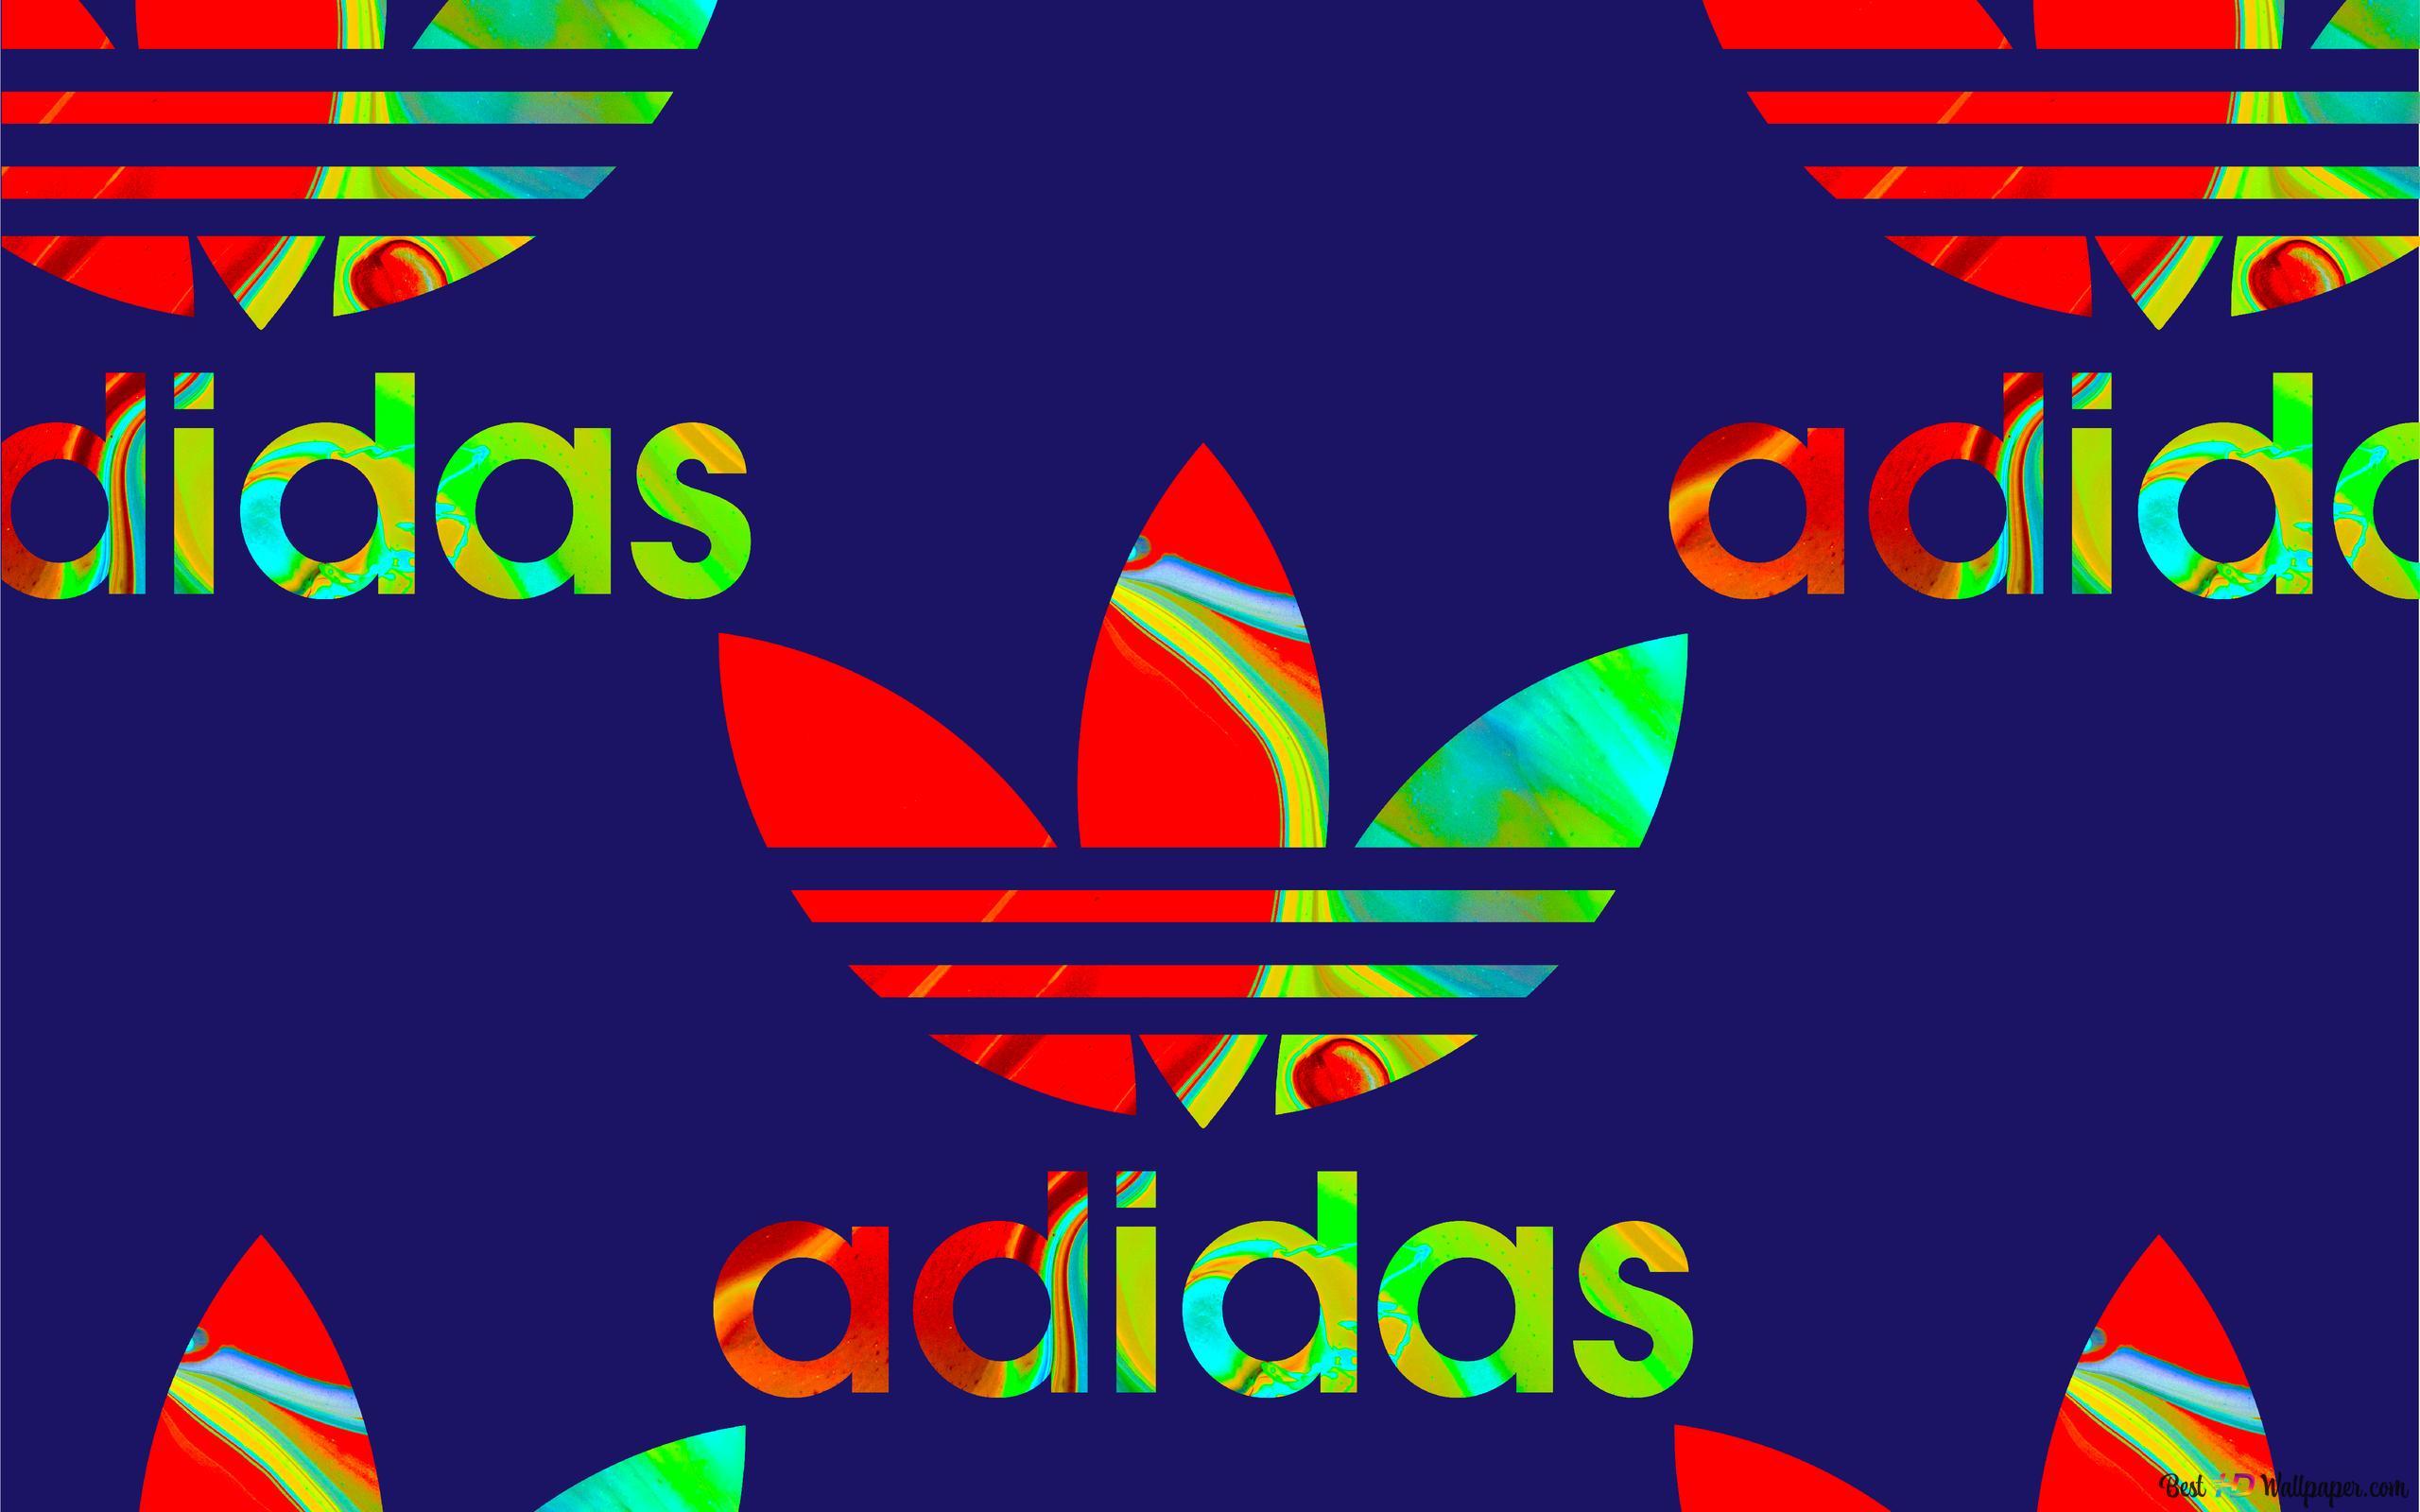 Adidas ロゴ 壁紙